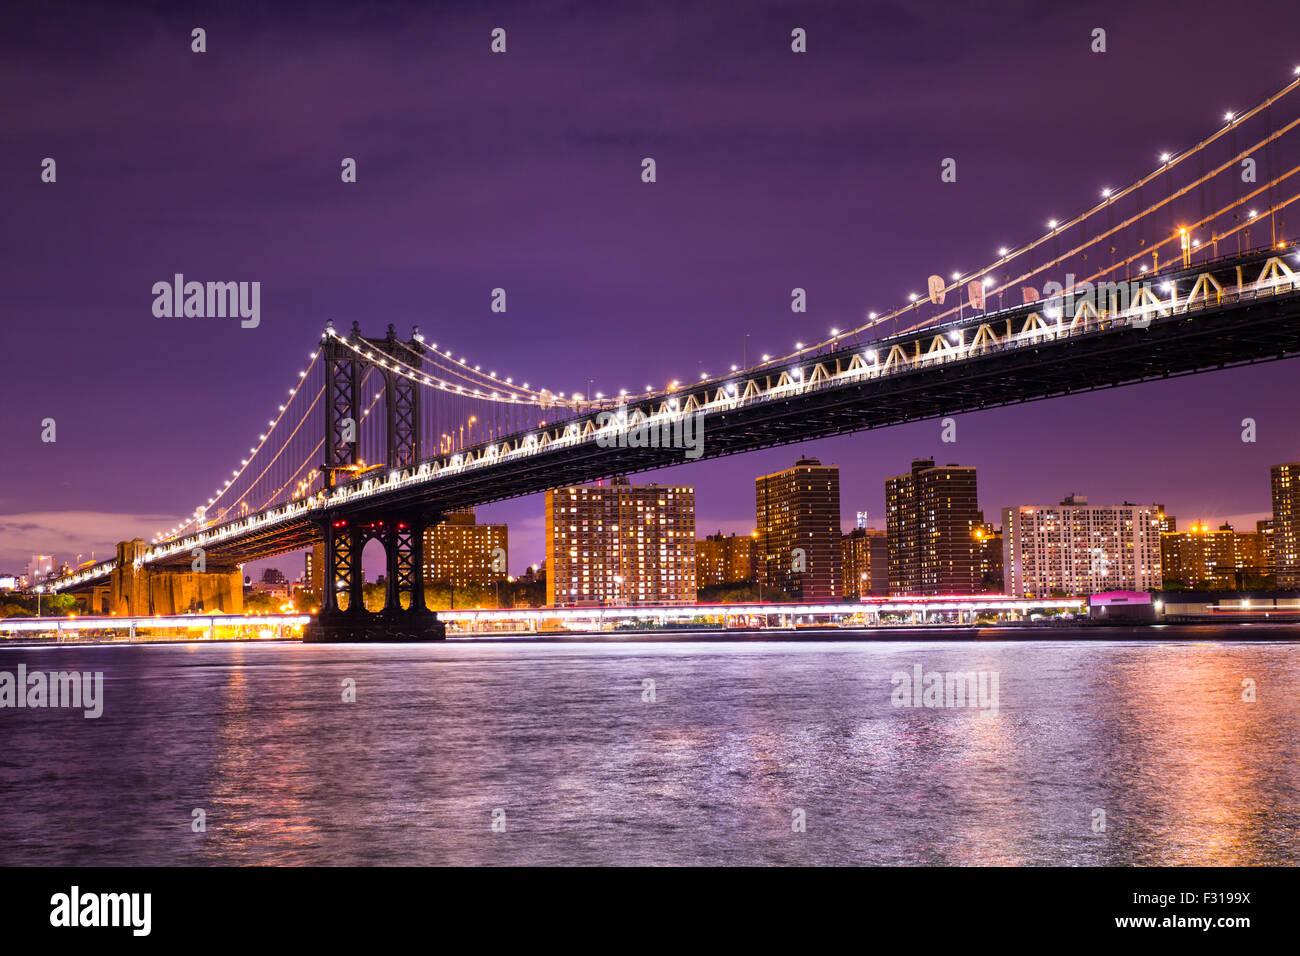 Vista notturna del ponte di Manhattan a New York City Foto Stock